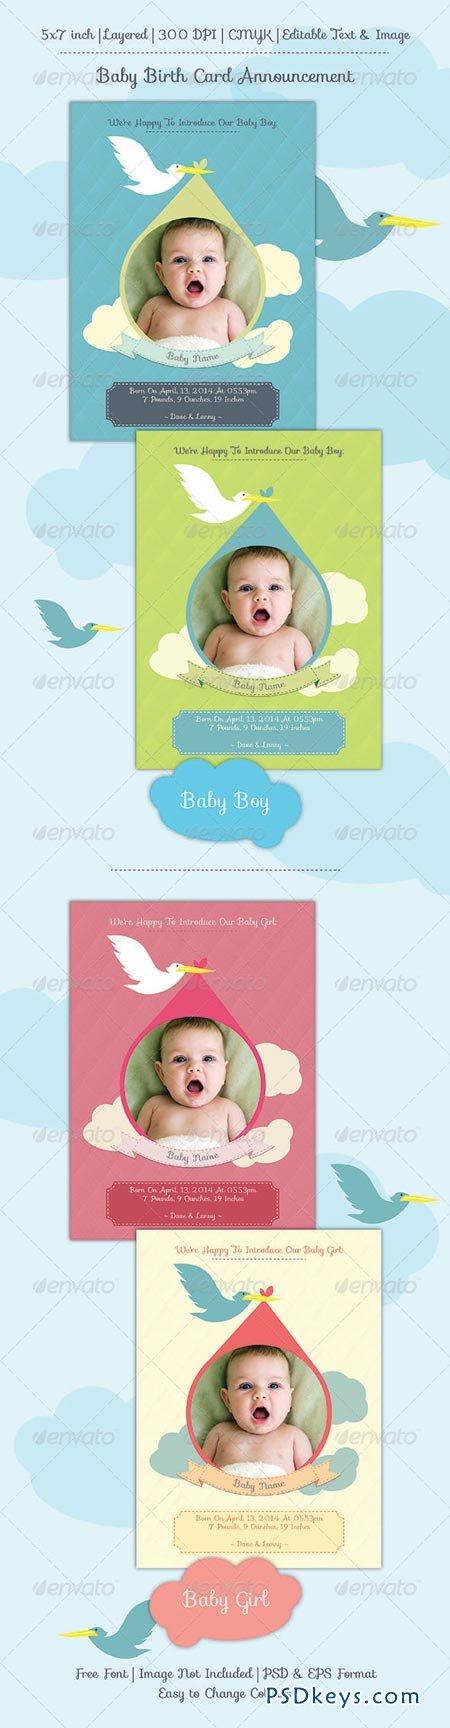 Baby Birth Announcement Card 6899658